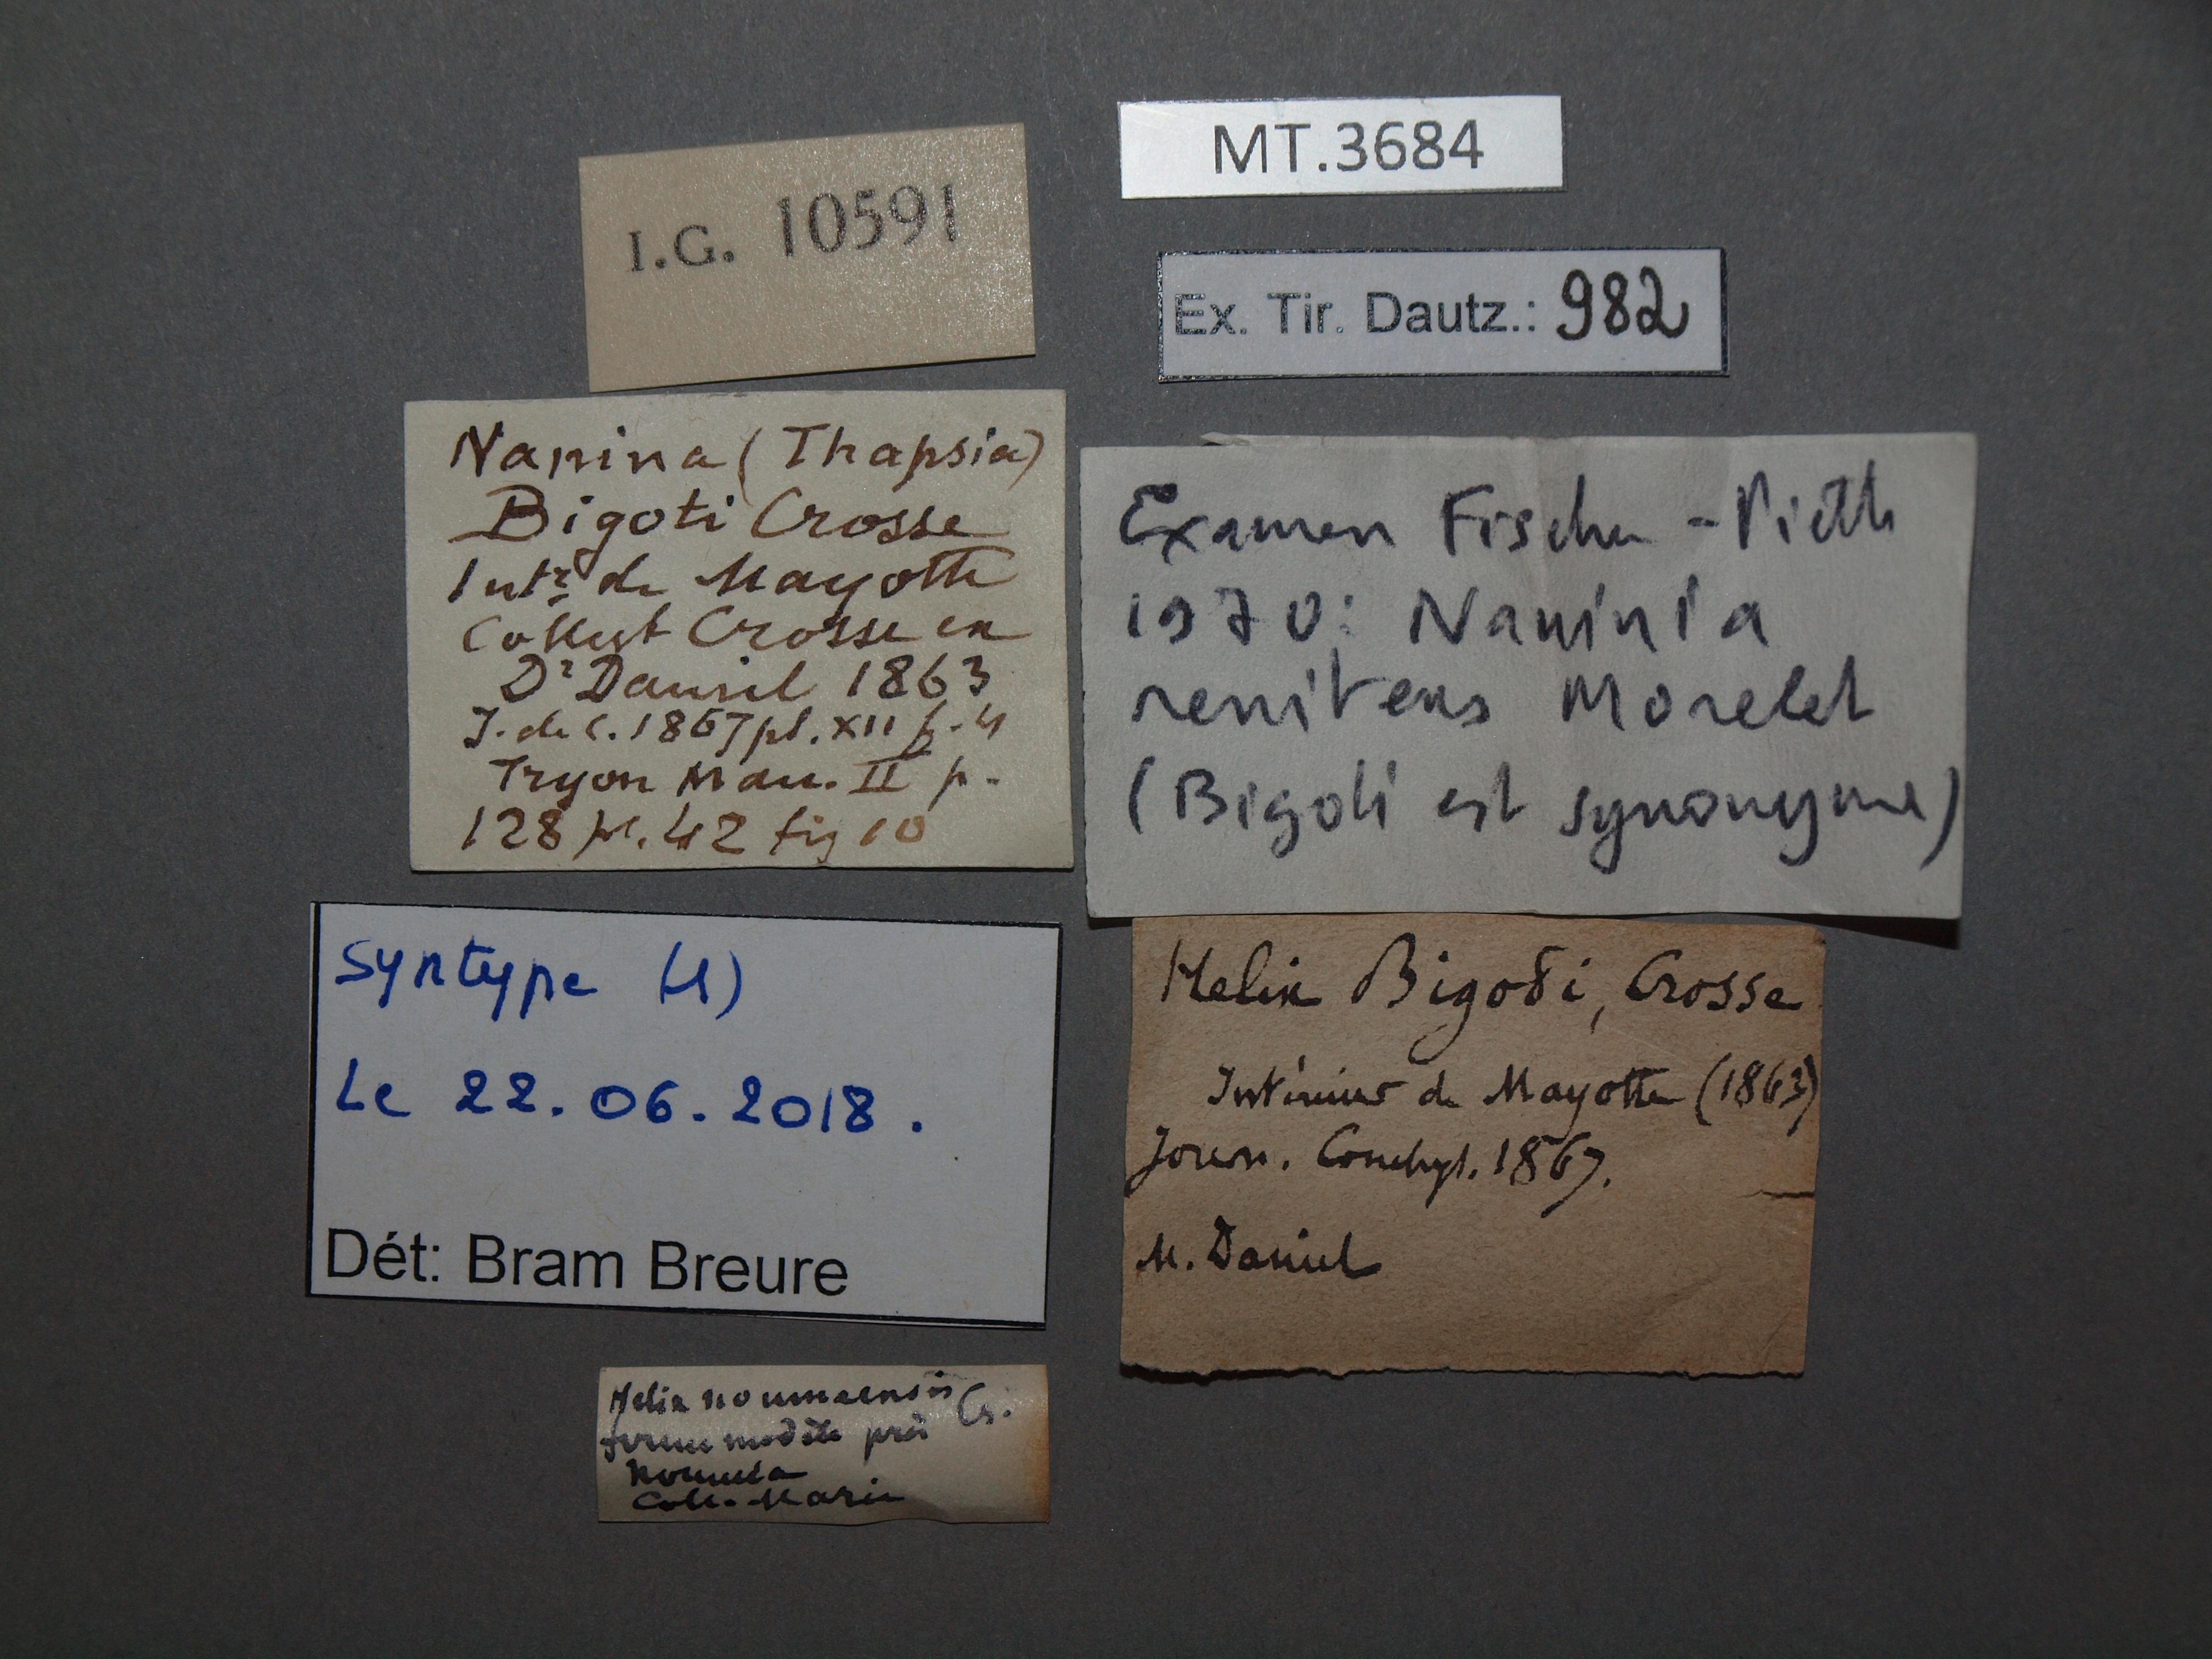 BE-RBINS-INV MT.3684 Helix bigotti st Lb.jpg